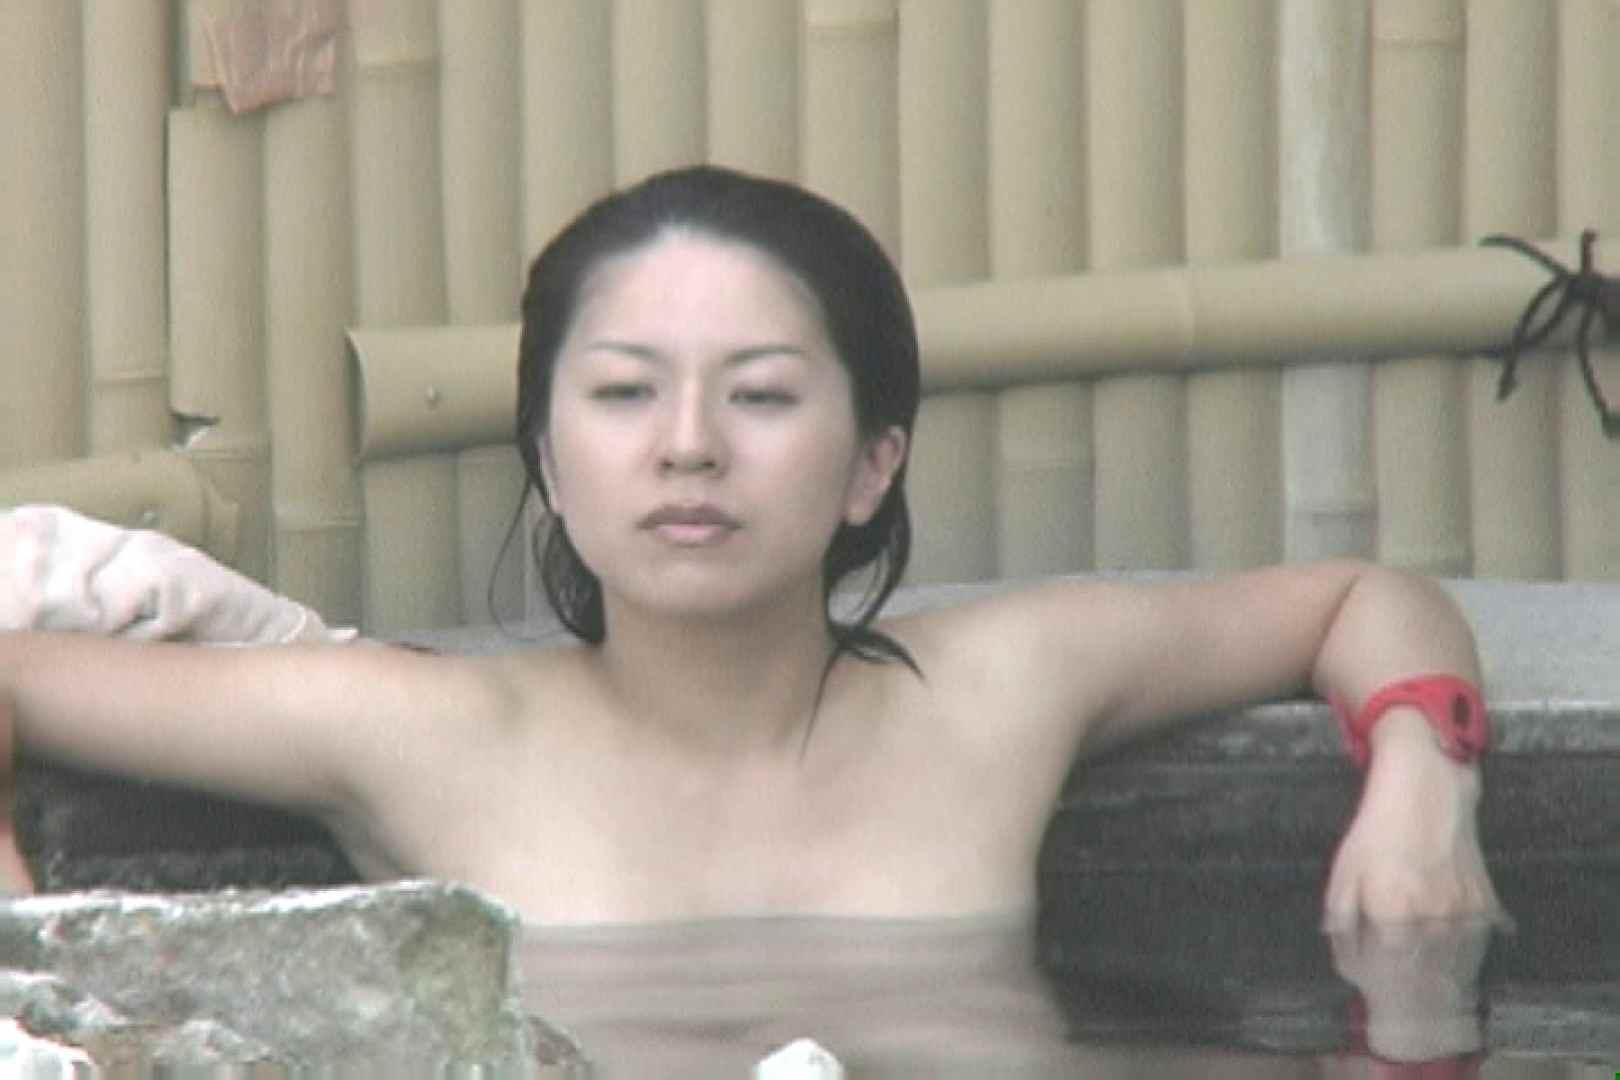 Aquaな露天風呂Vol.694 露天風呂編  83PIX 44